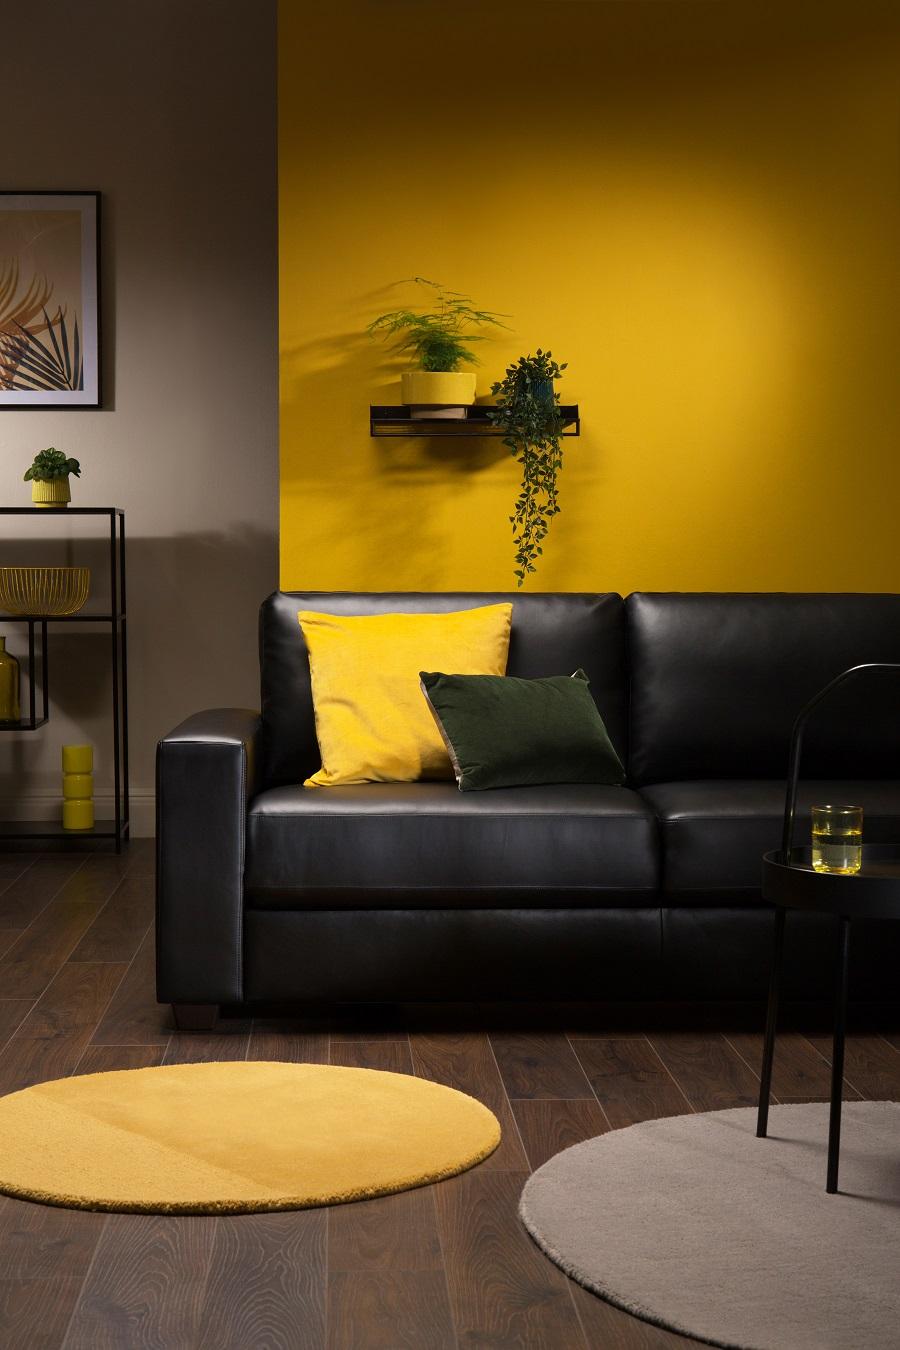 FC Mission Black Leather Sofa £399.99 www.furniturechoice.co.uk.jpg